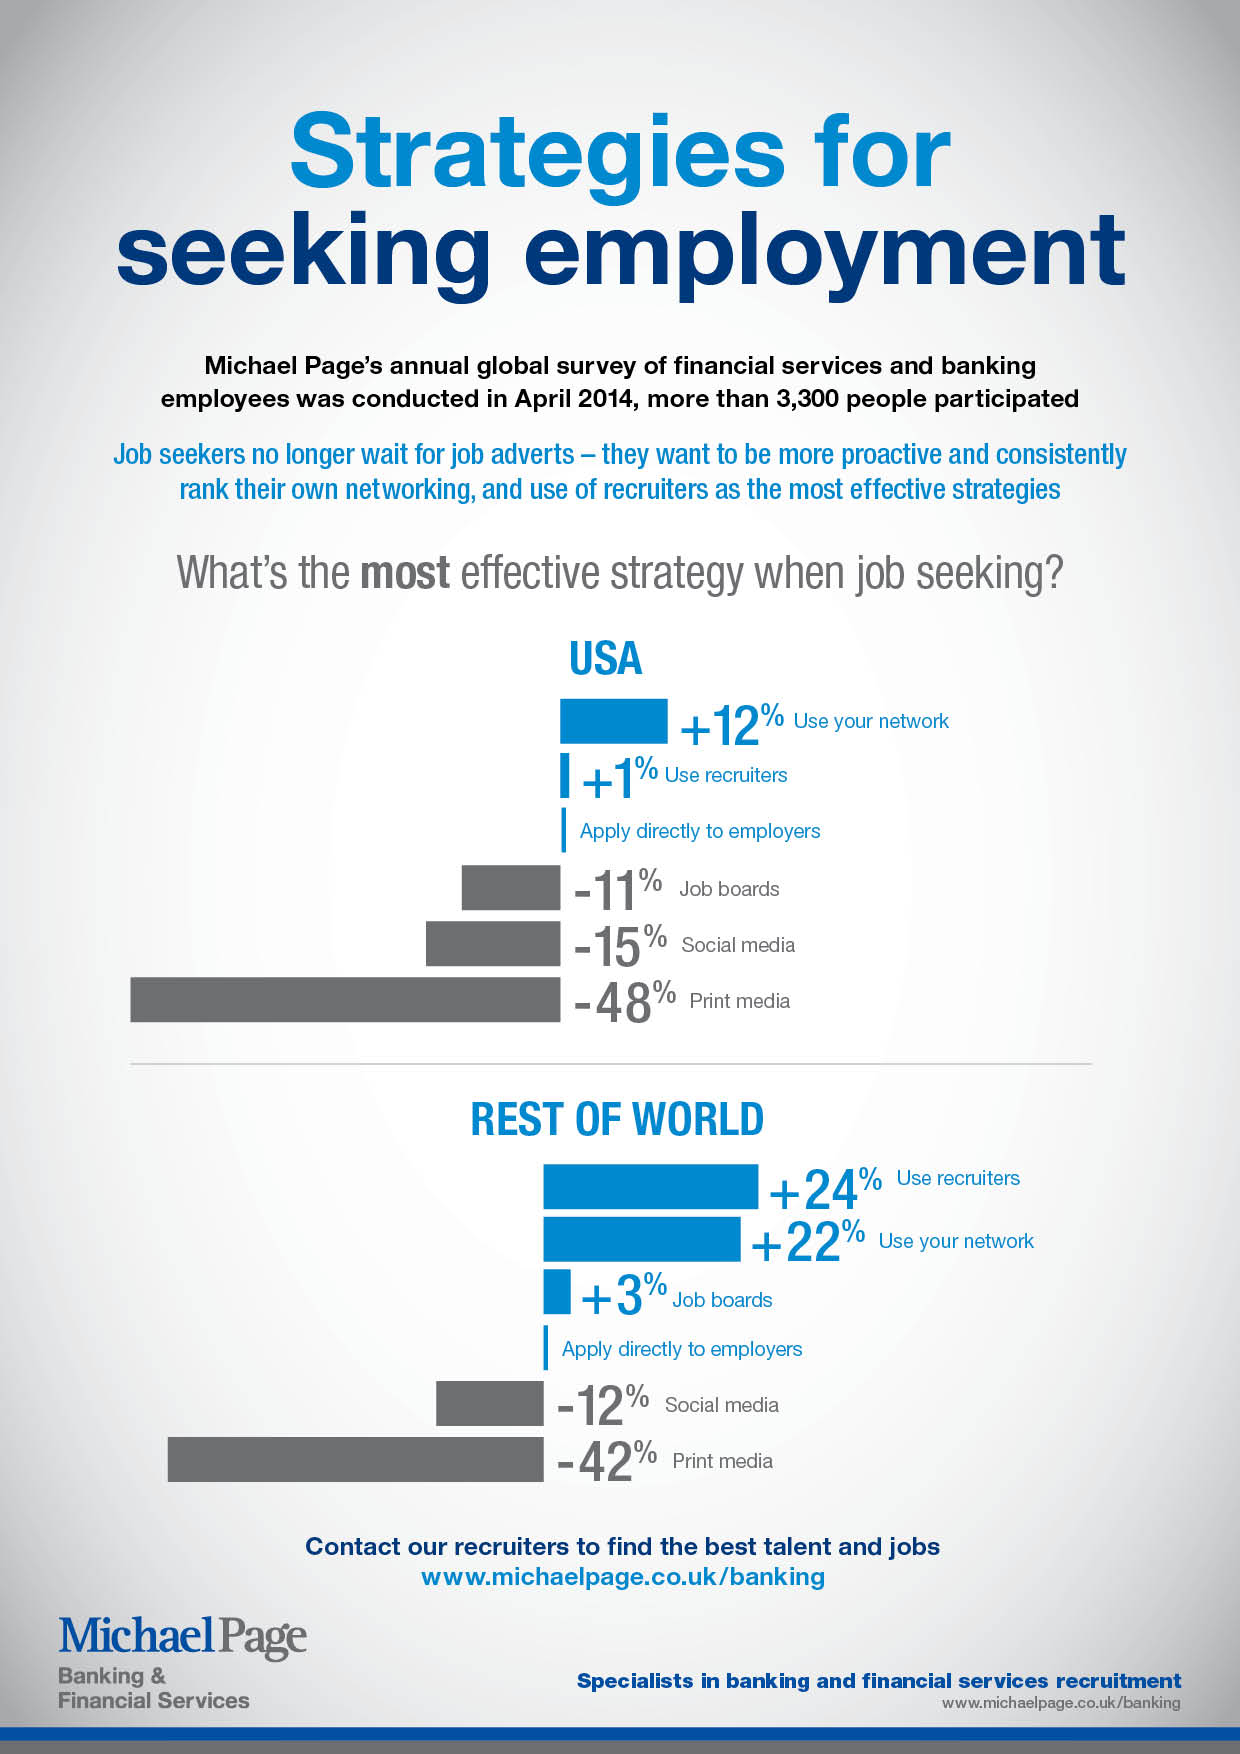 Strategies for seeking employment